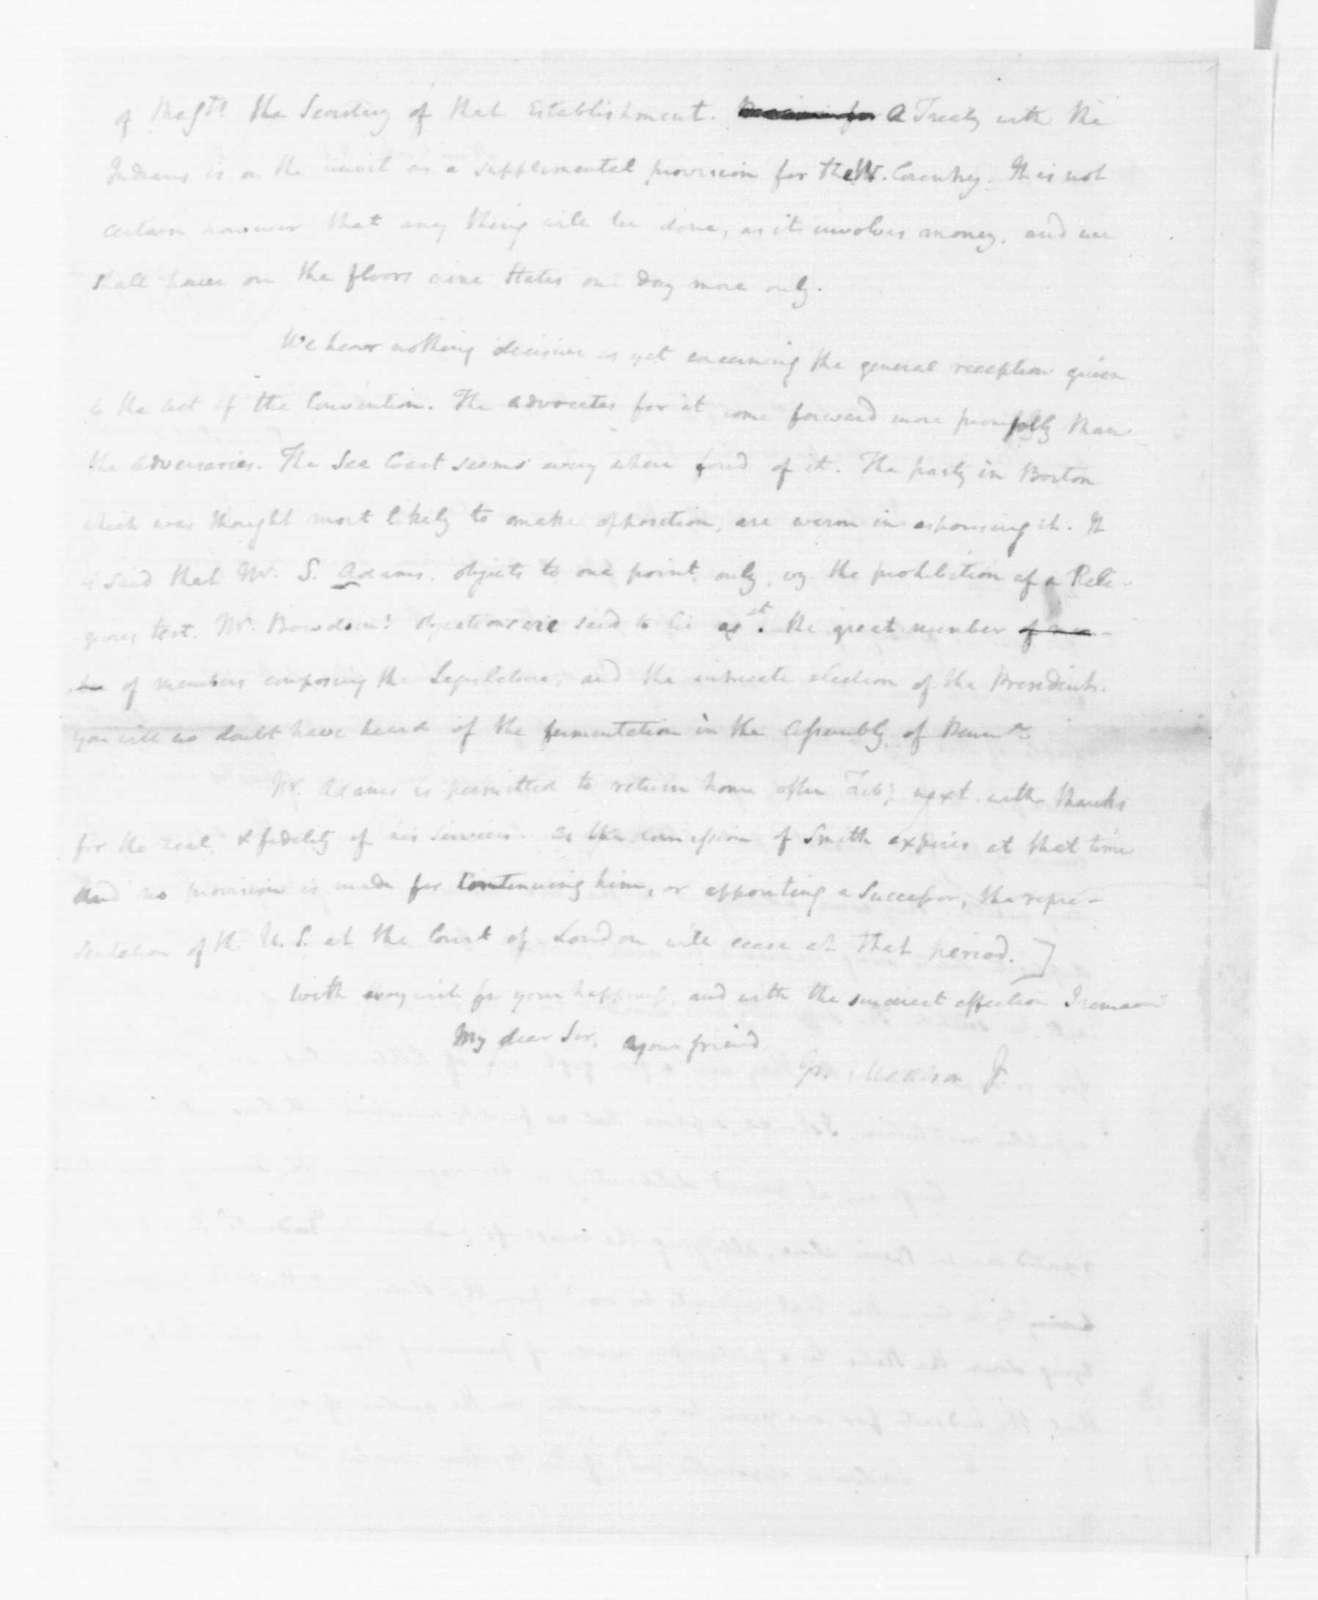 James Madison to Edmund Randolph, October 5, 1787.